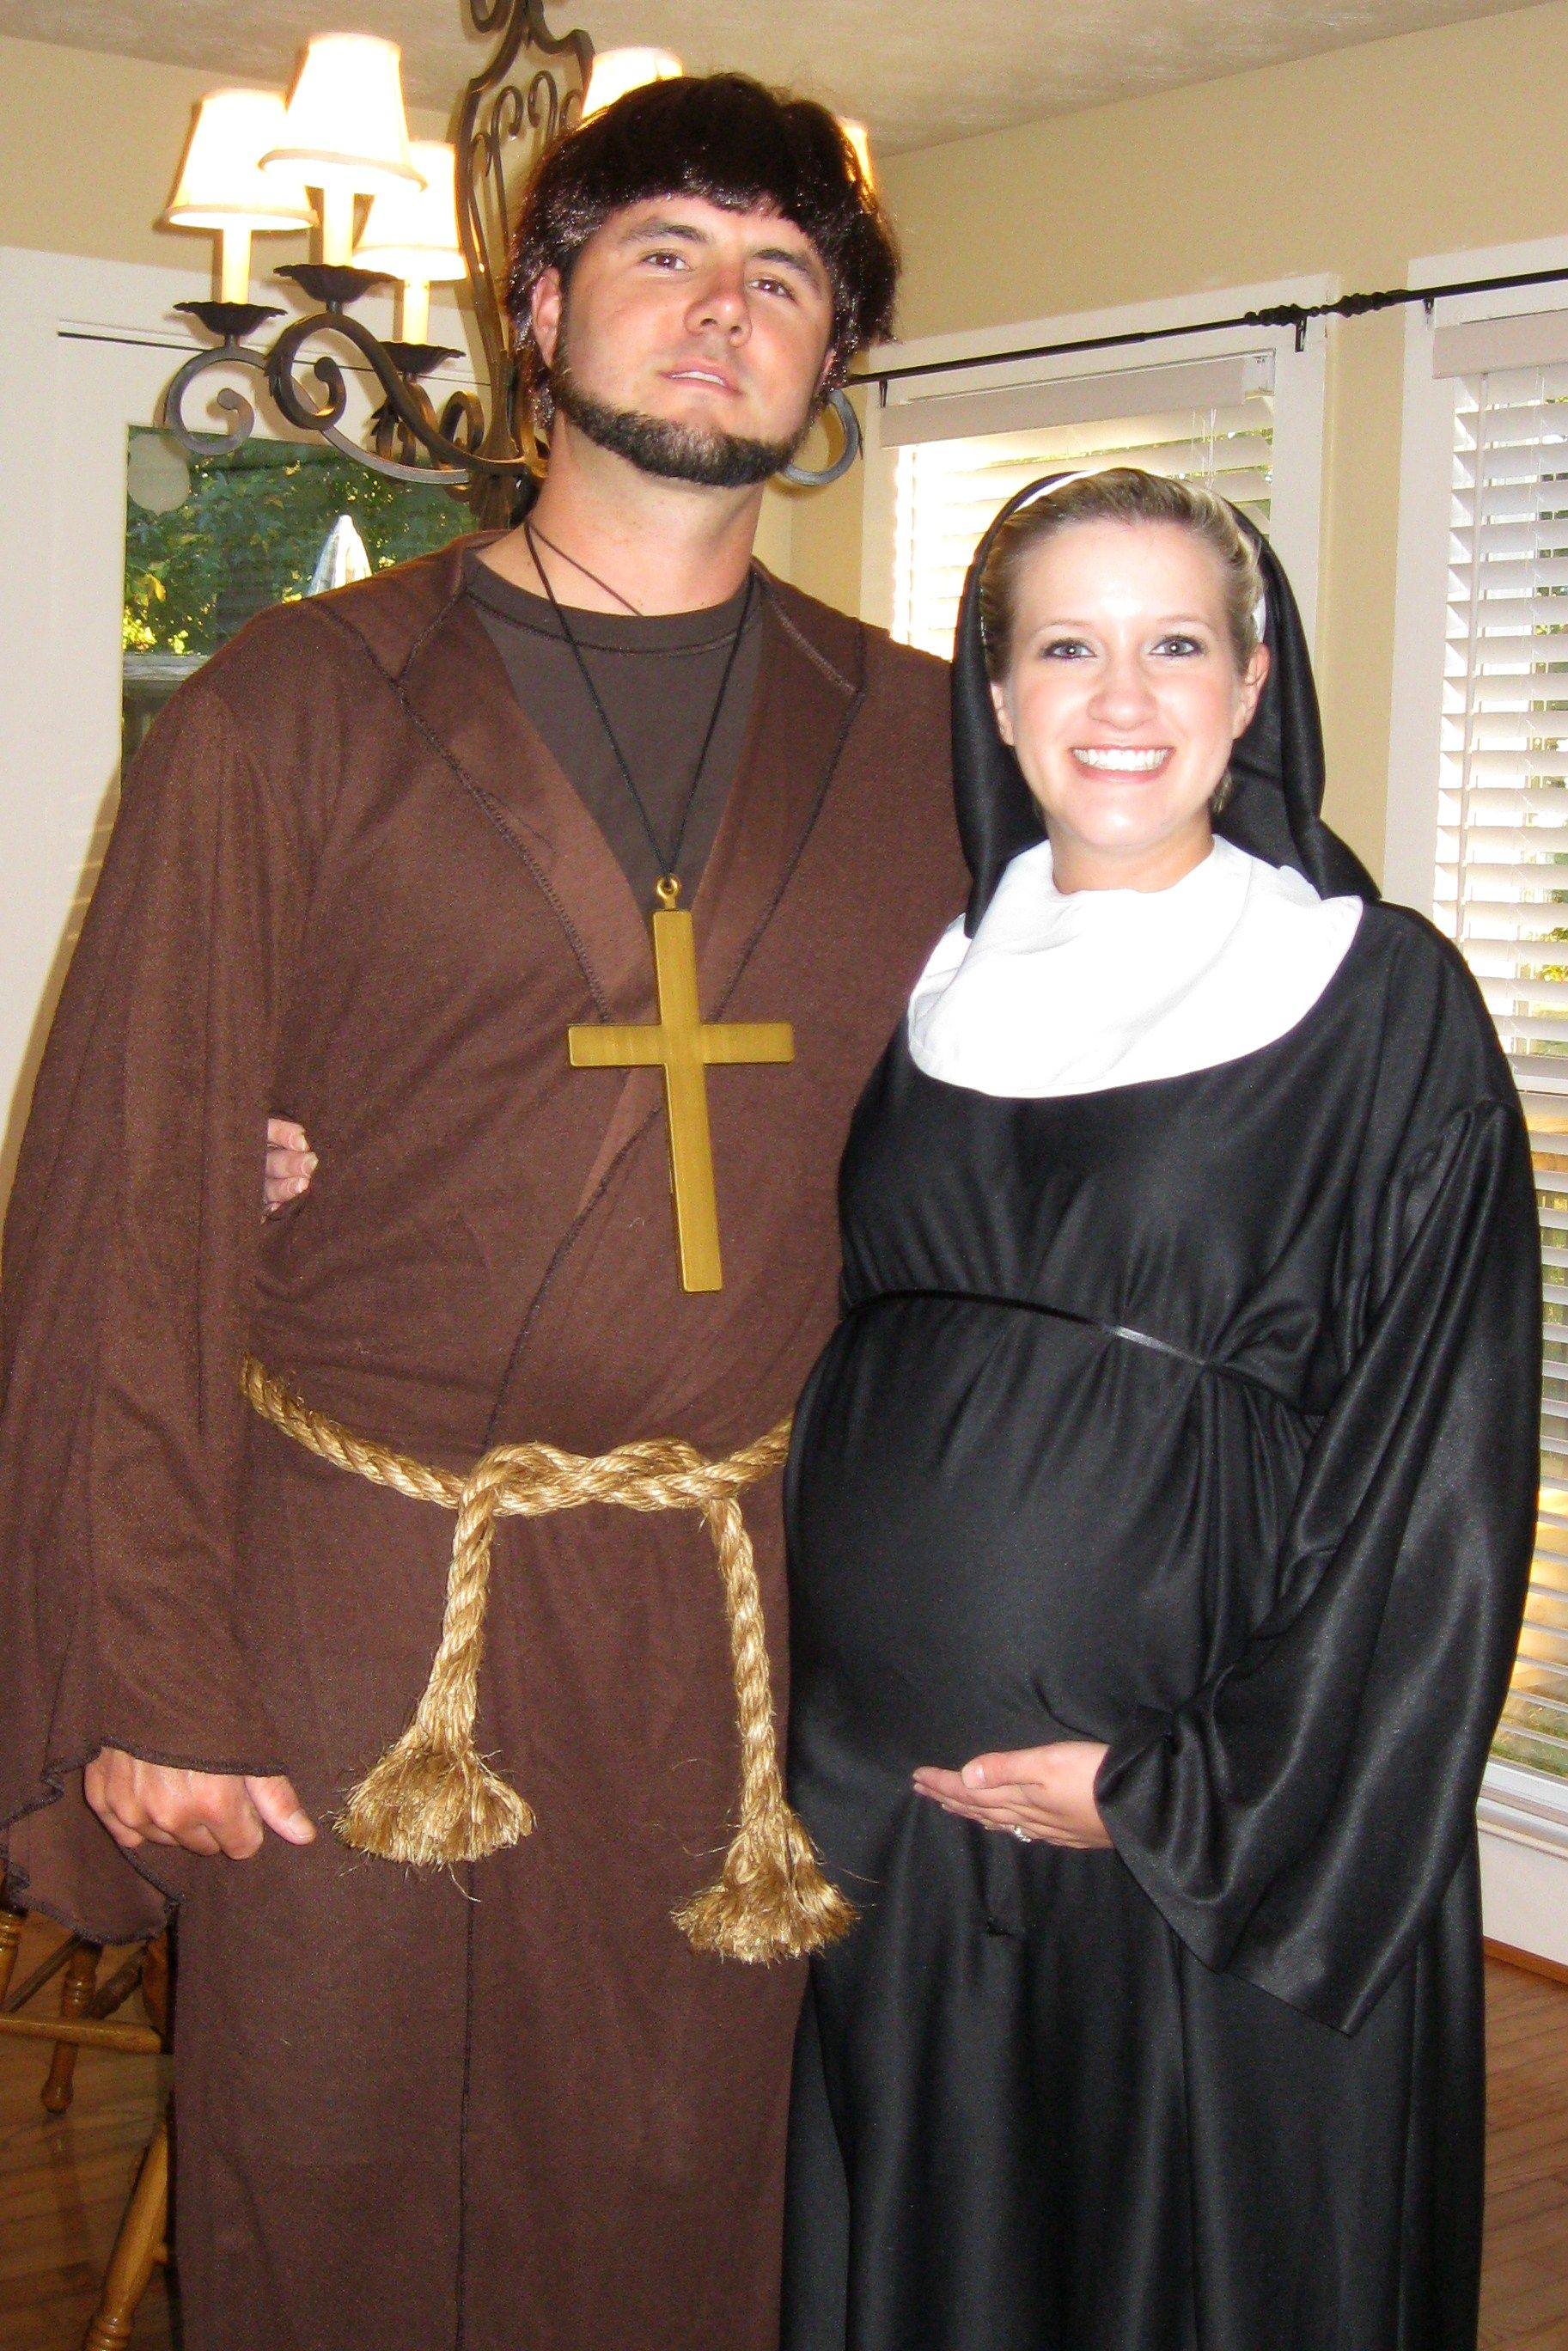 Pregnant Nunand Monk Halloween Costumes Pinterest Pregnant